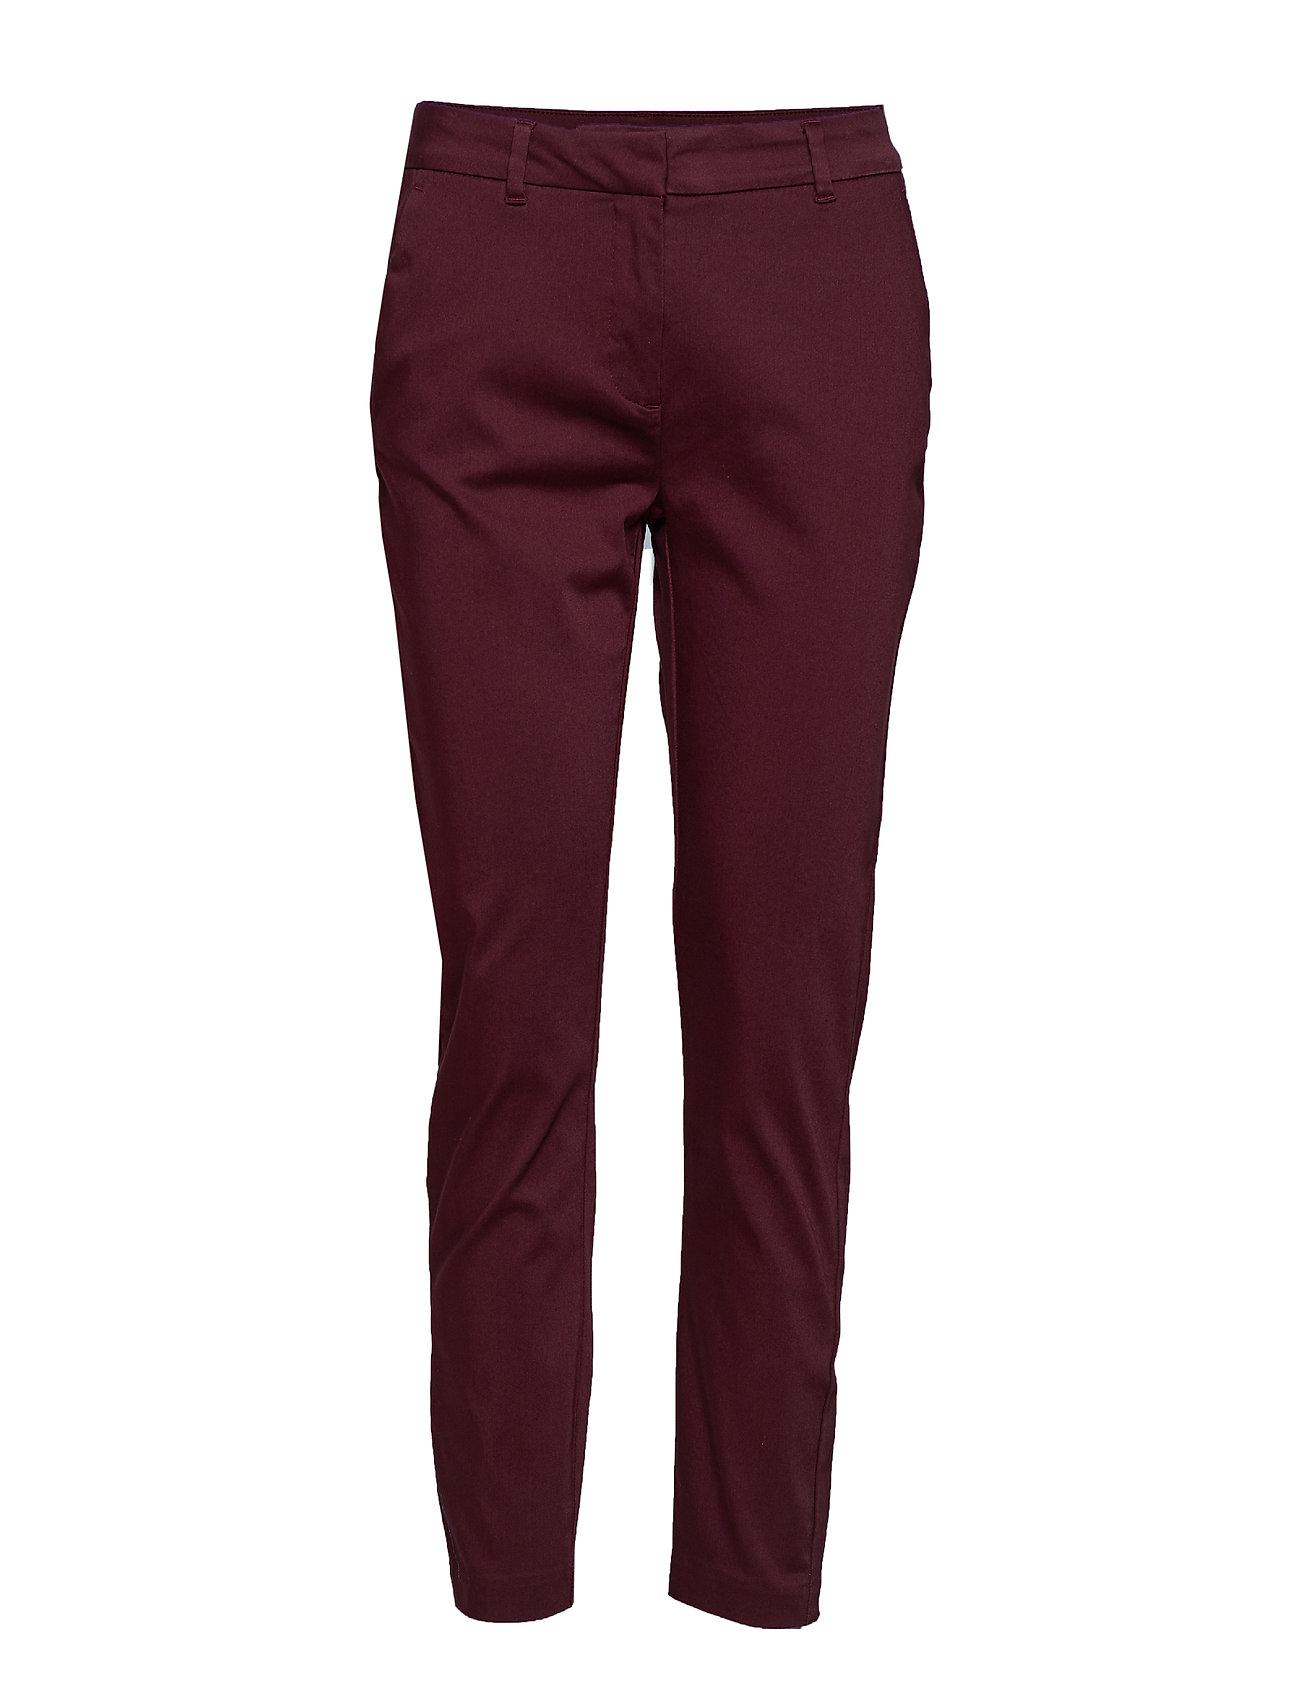 2nd One Carine 065 Pants - ROYAL